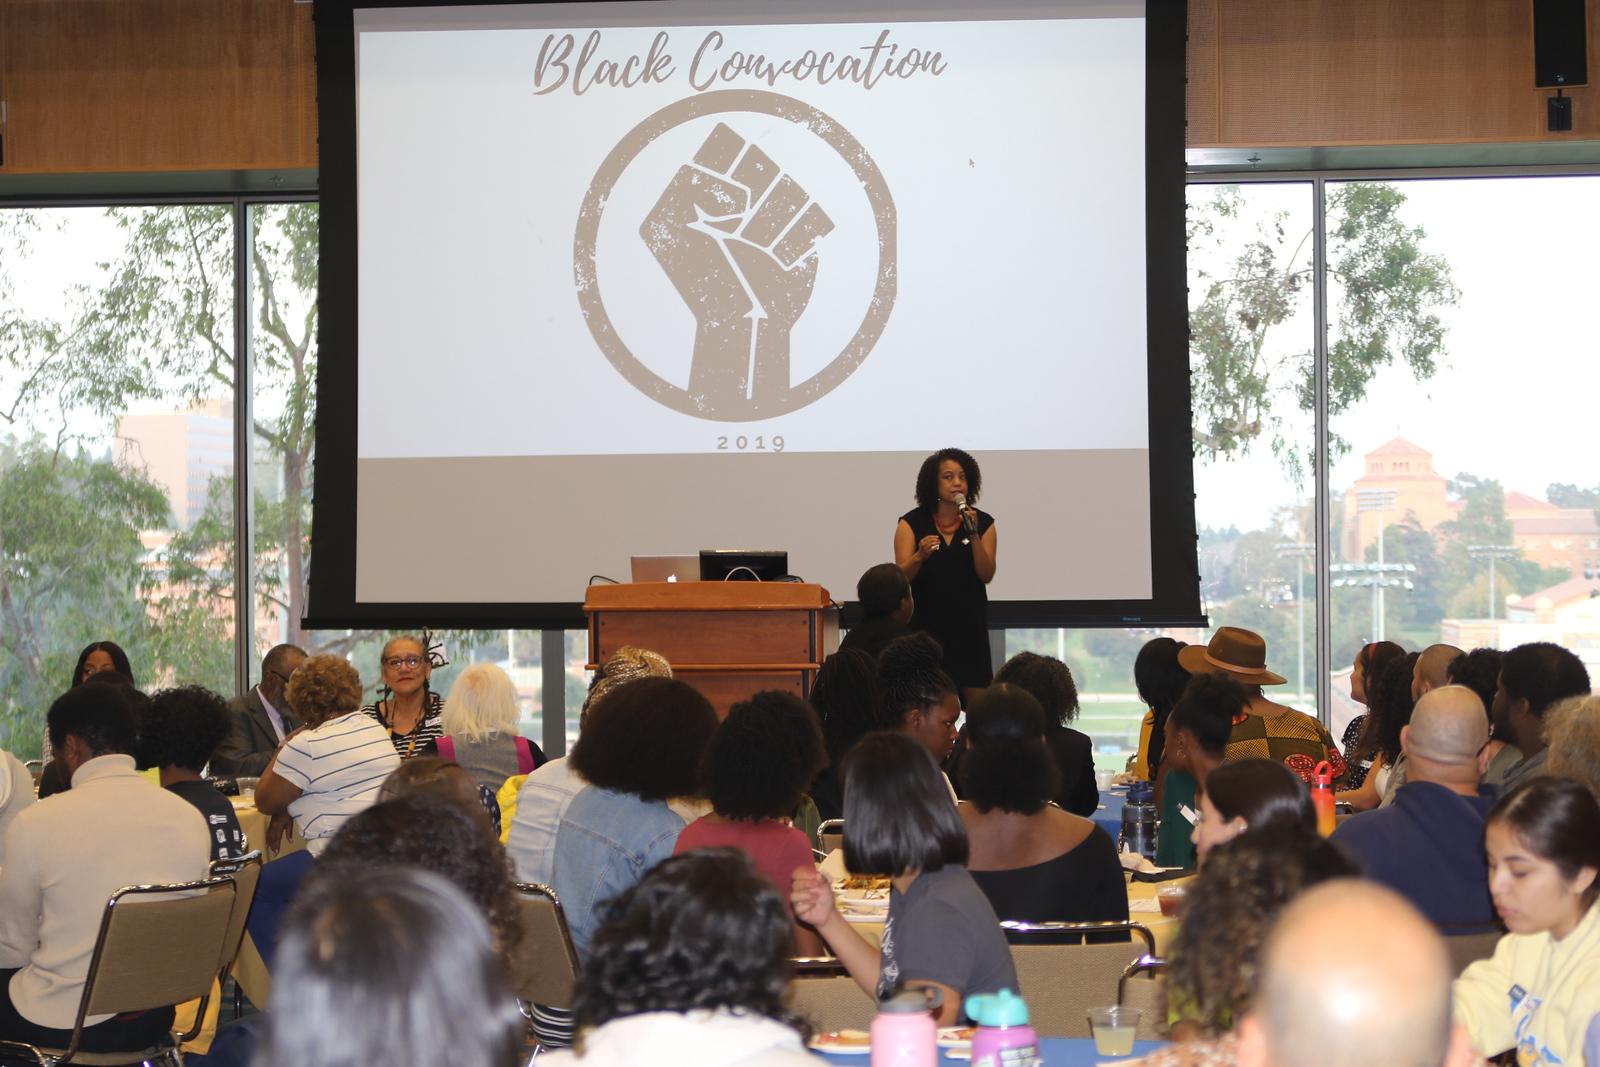 Black Convocation 2019